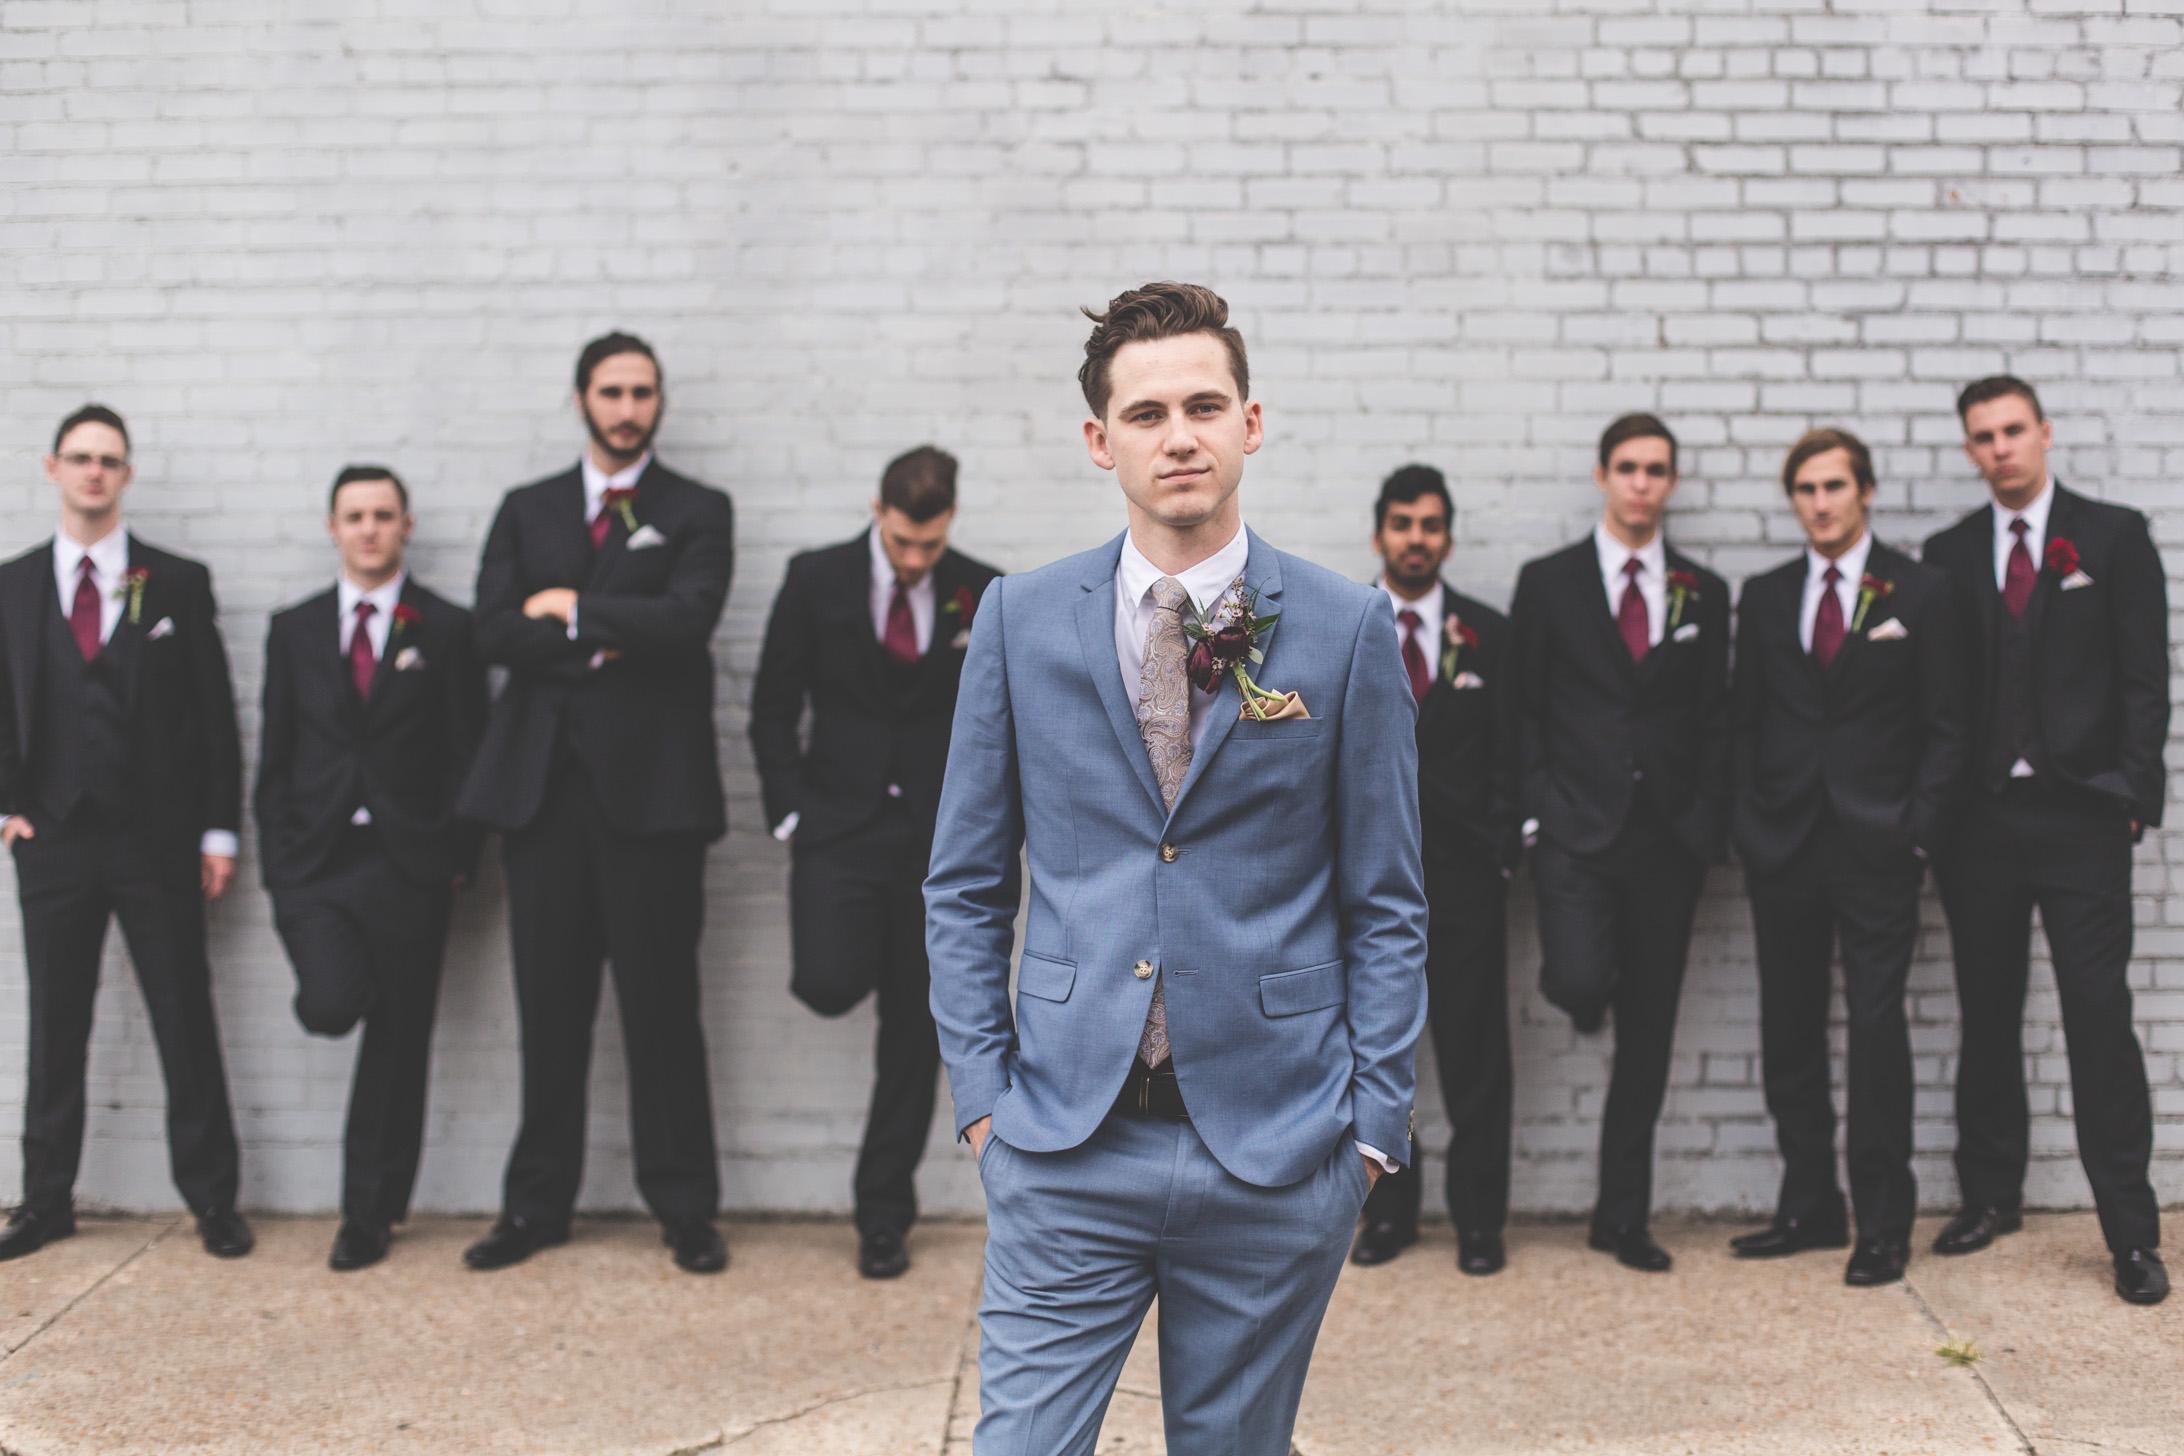 Adam-Szrmack-The-Glass-Factory-Wedding-53.jpg